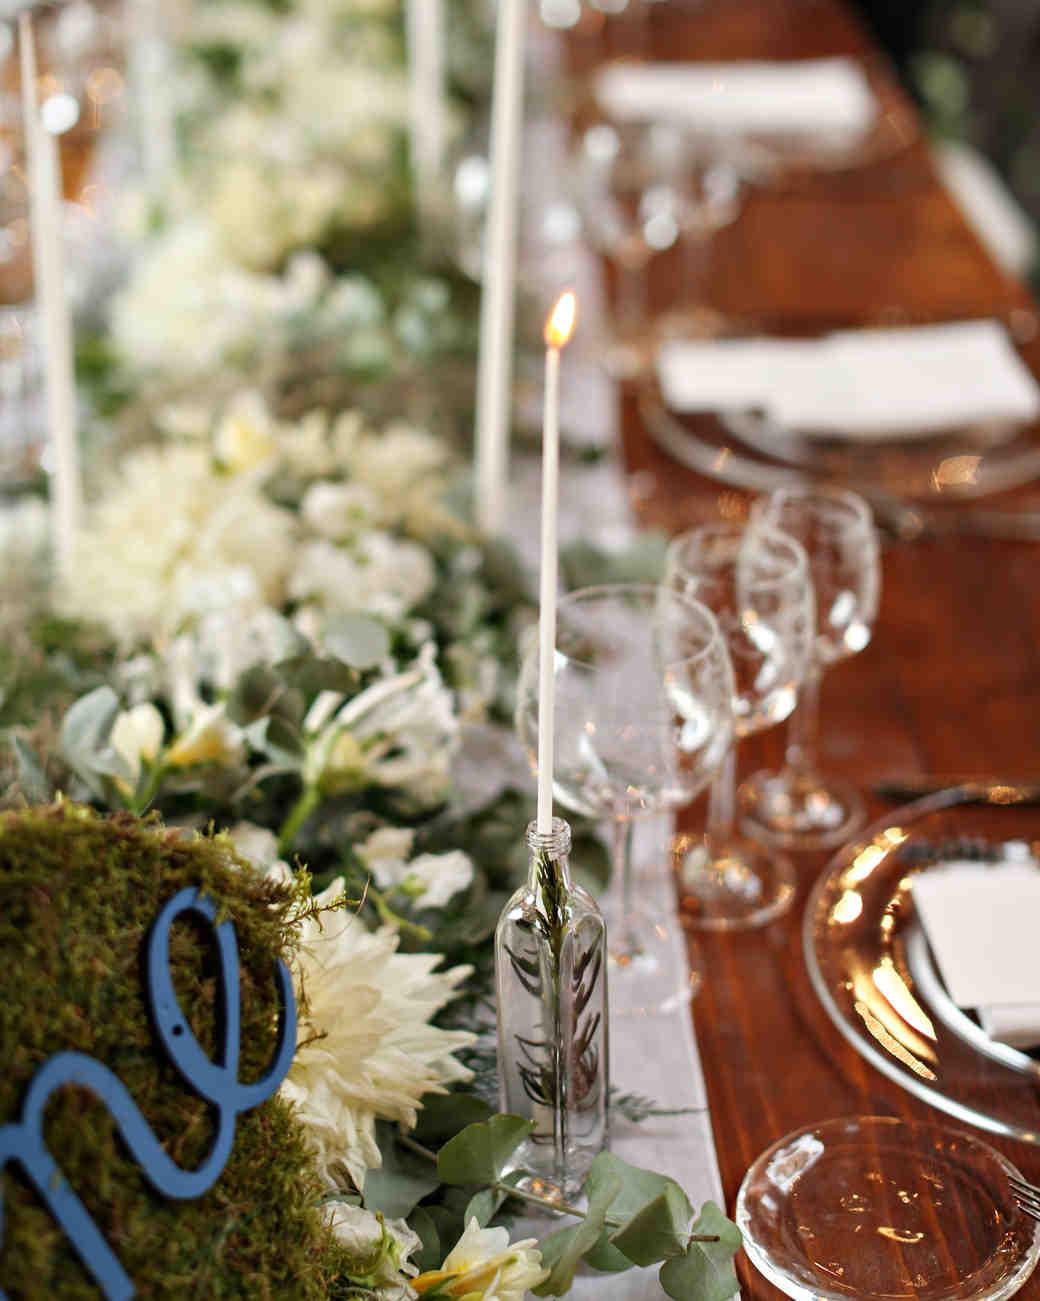 lindsay-andy-wedding-table-8131-s111659-1114.jpg